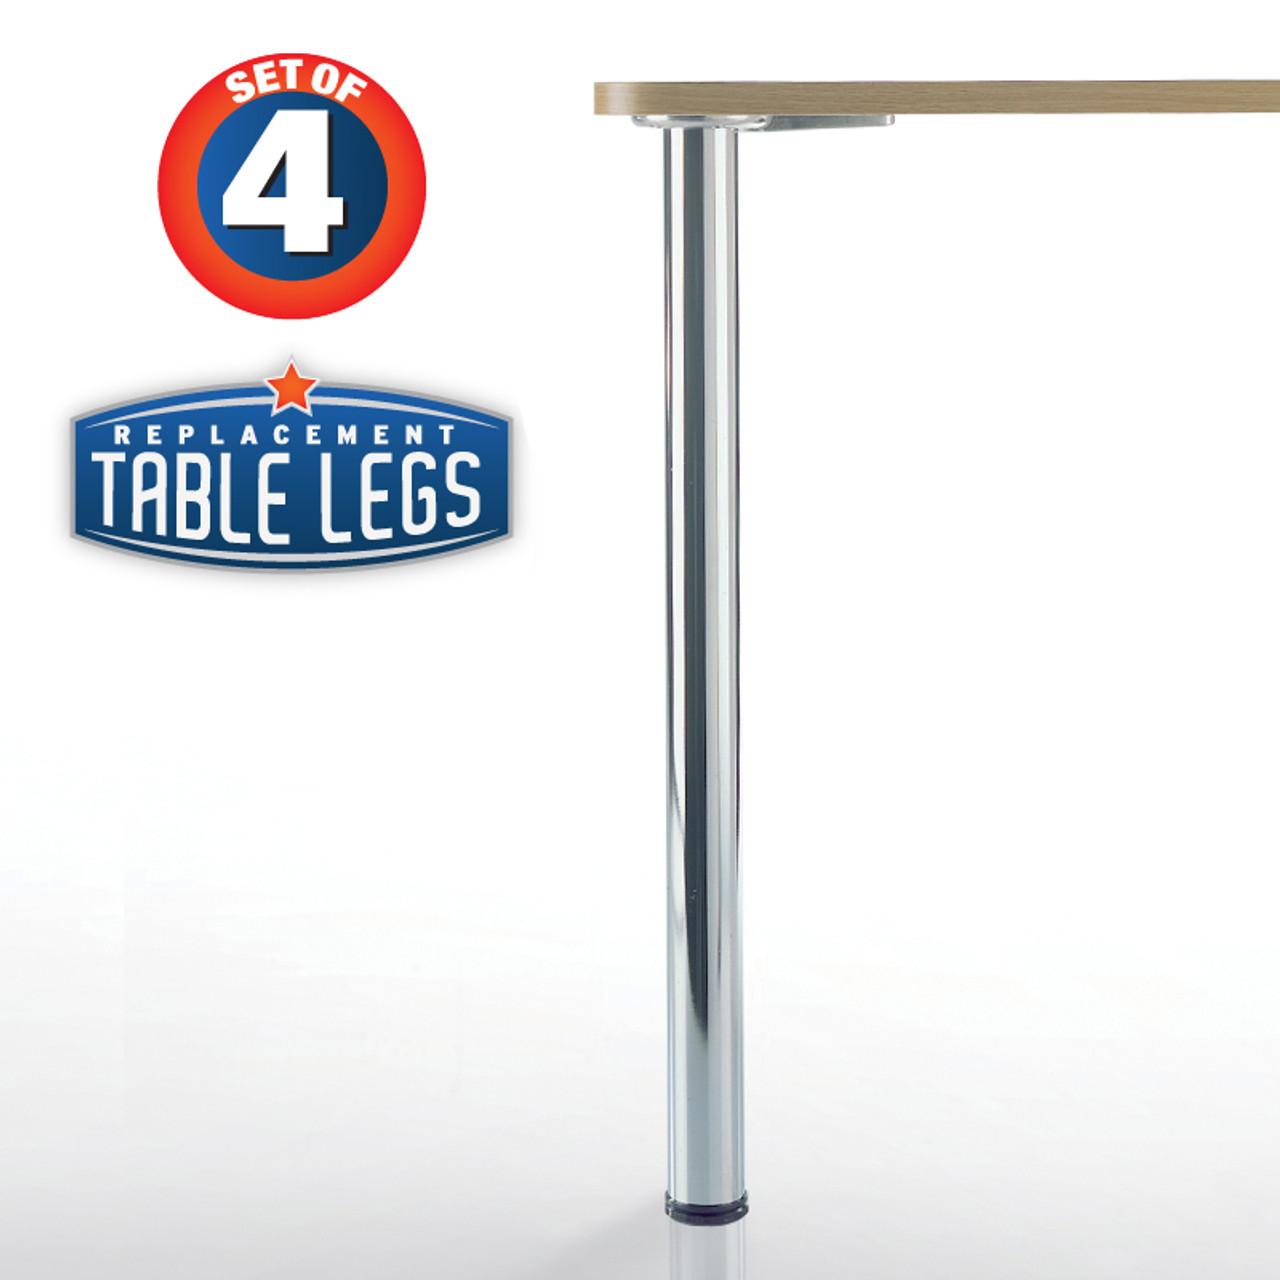 prisma table legs 34 1 4 counter height 2 3 8 diameter 1 1 8 adjustable foot set of 4